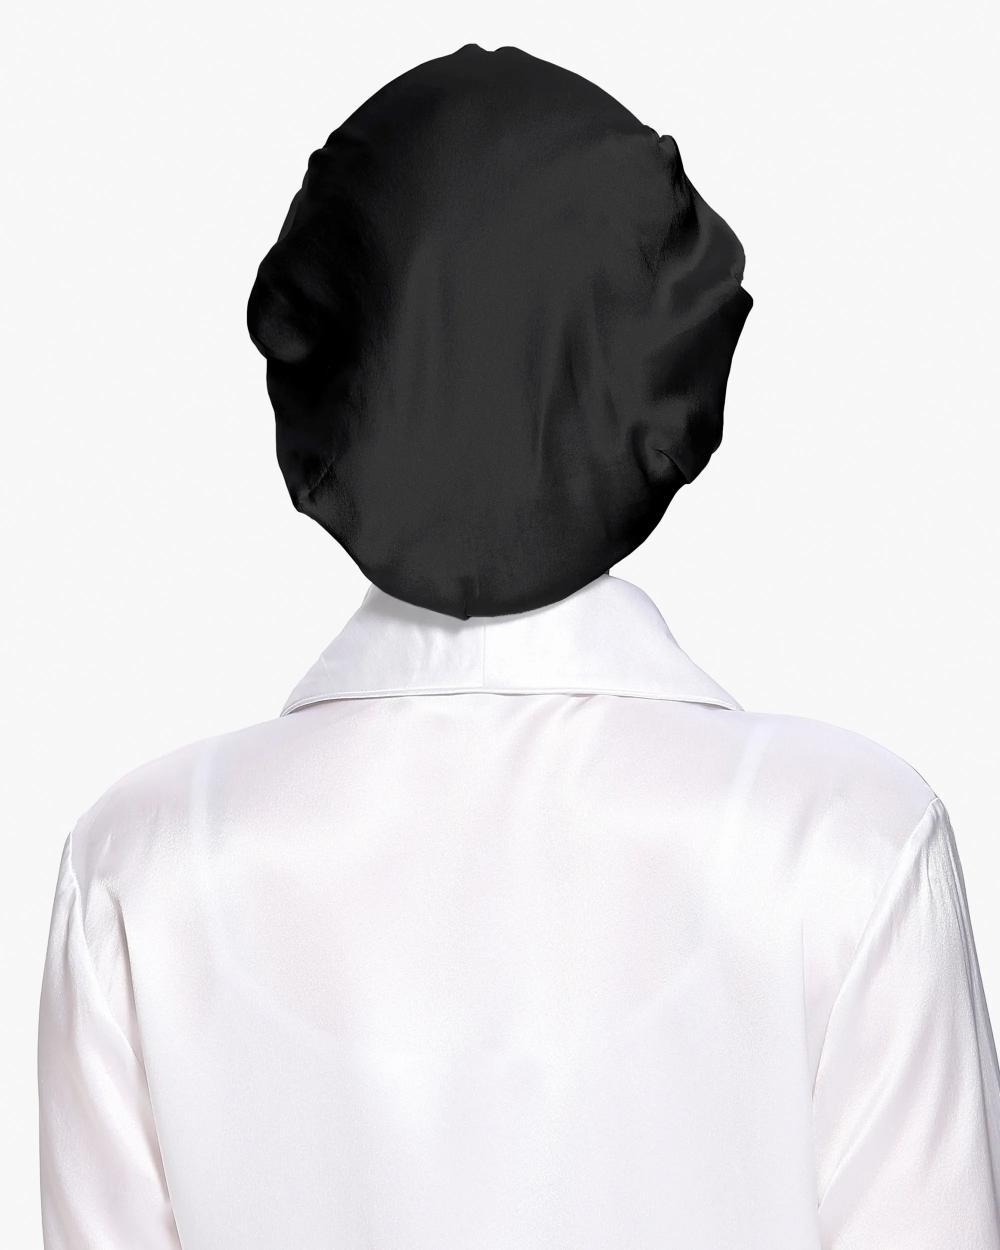 Black Cap 4 Jpg